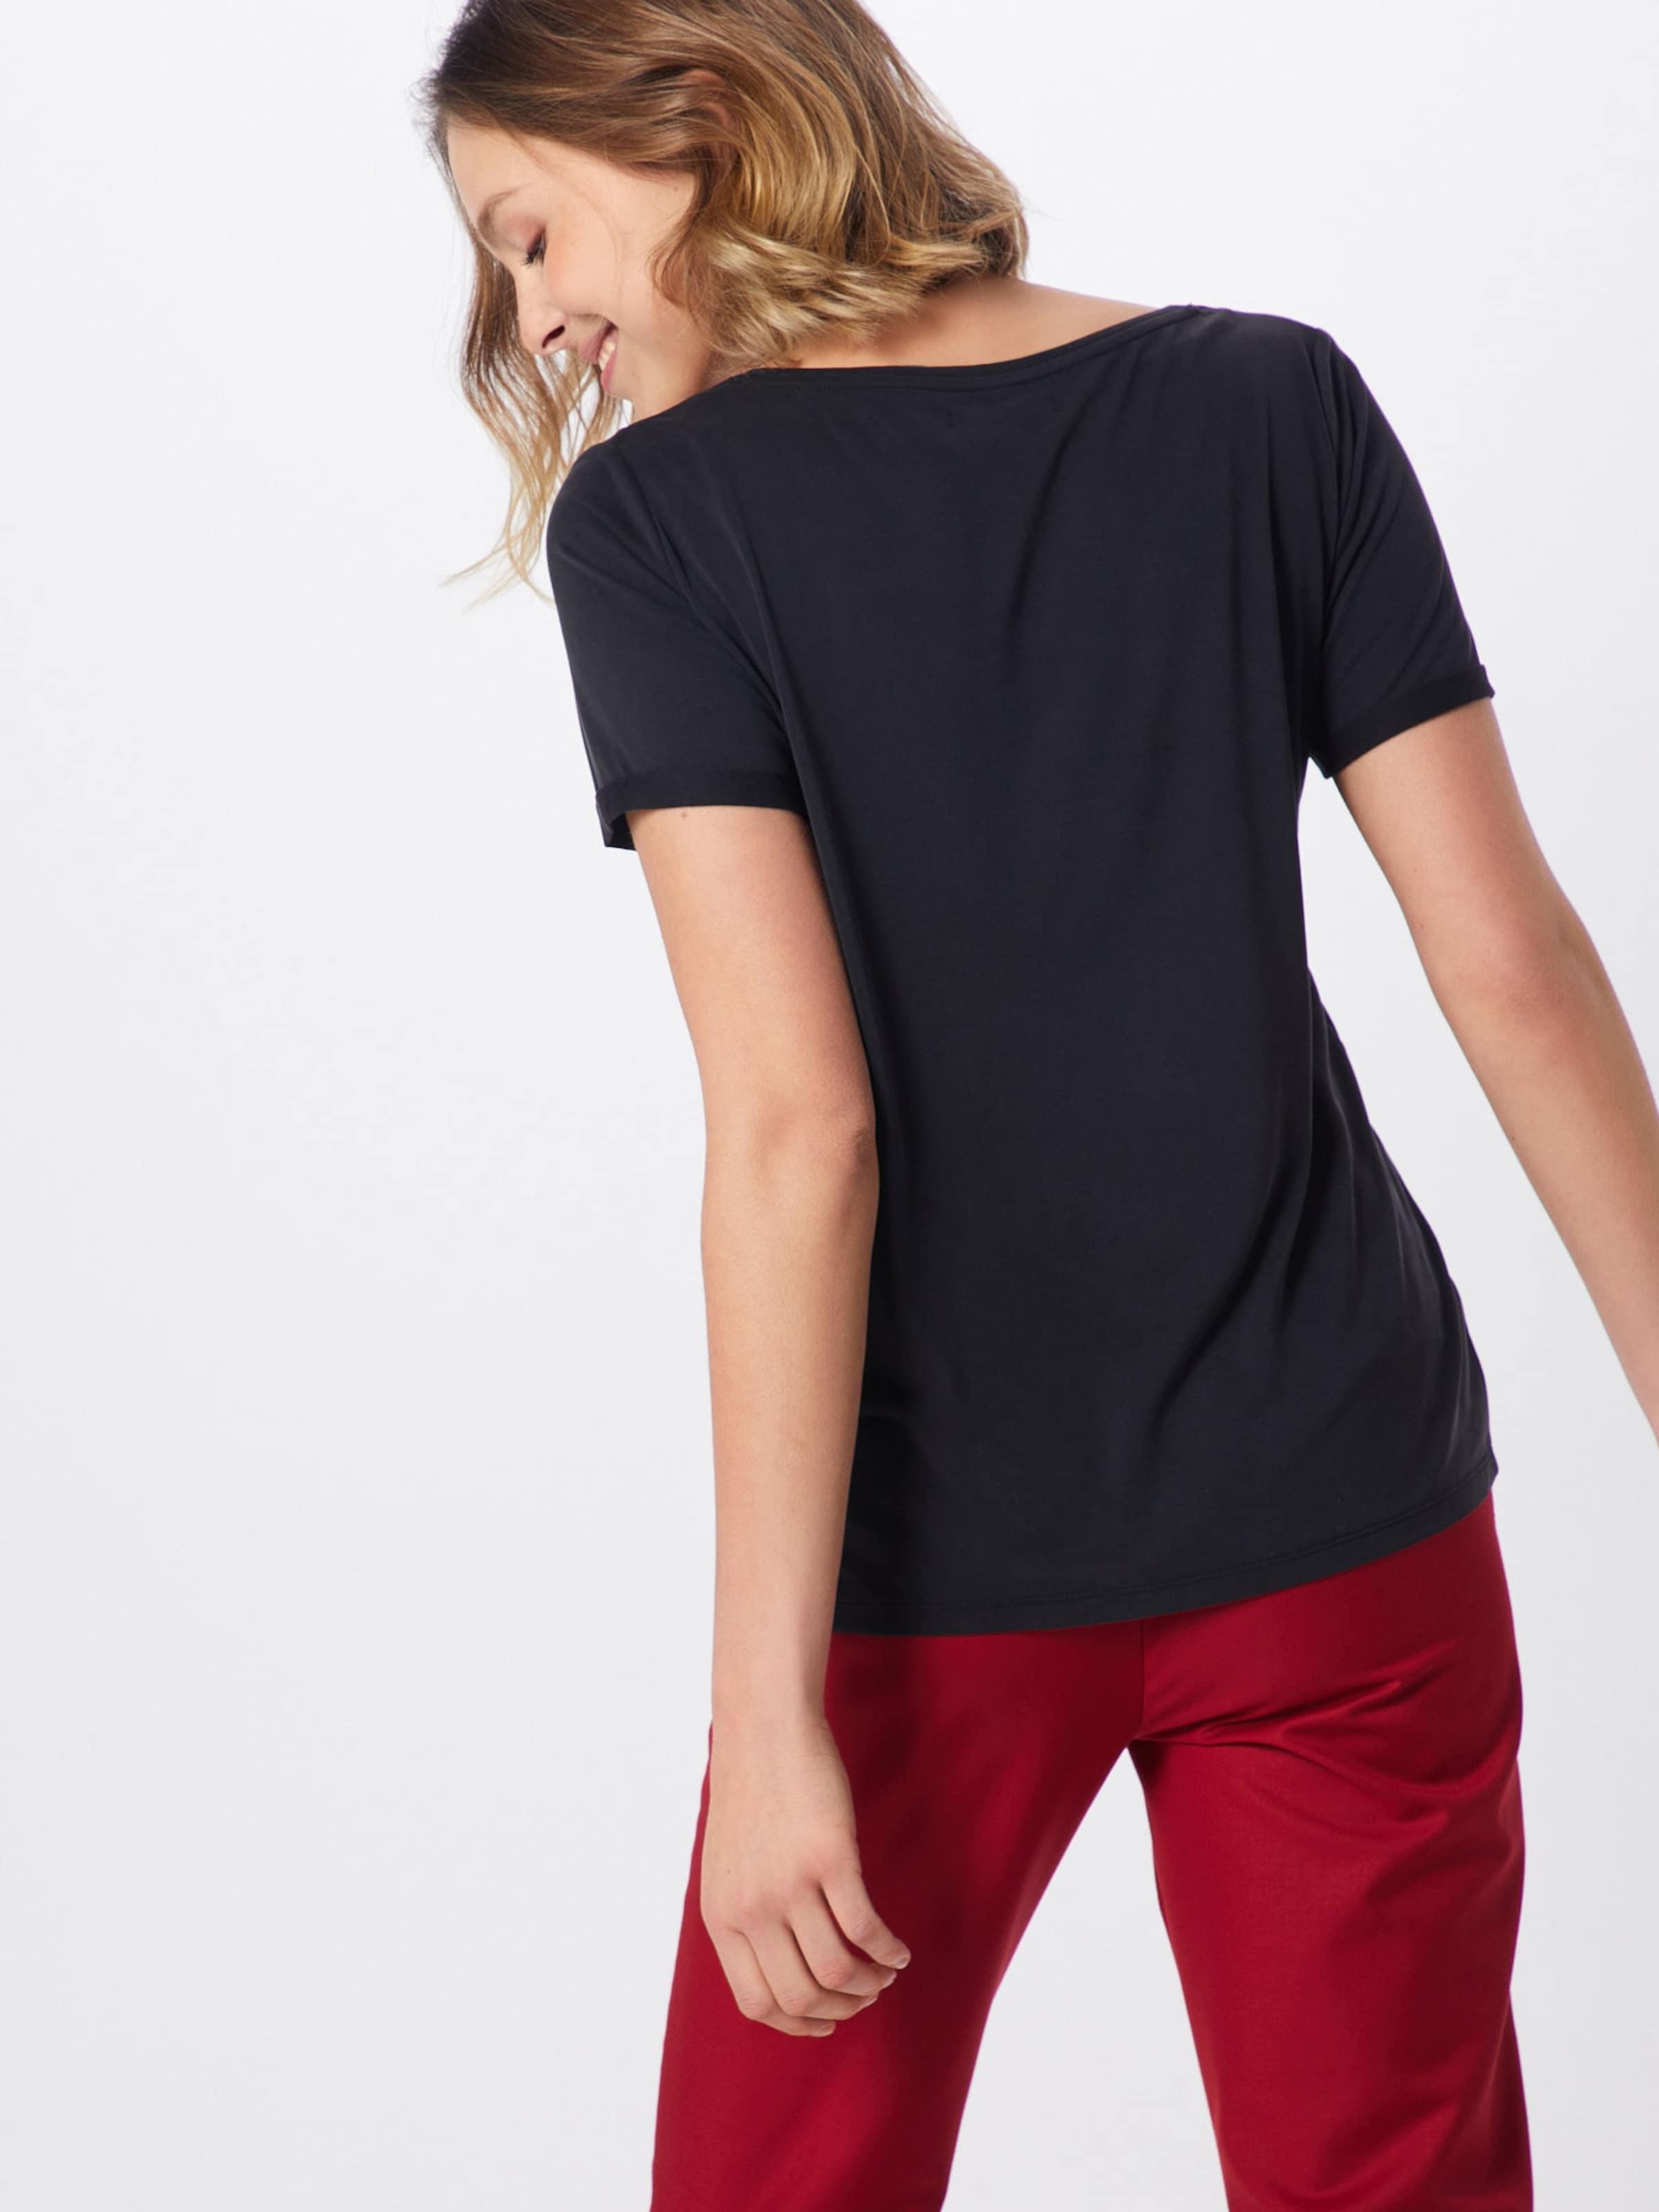 shirt Pb' 'pchavala Tee T V Noir En neck Ss Pieces D2d EI2WHD9